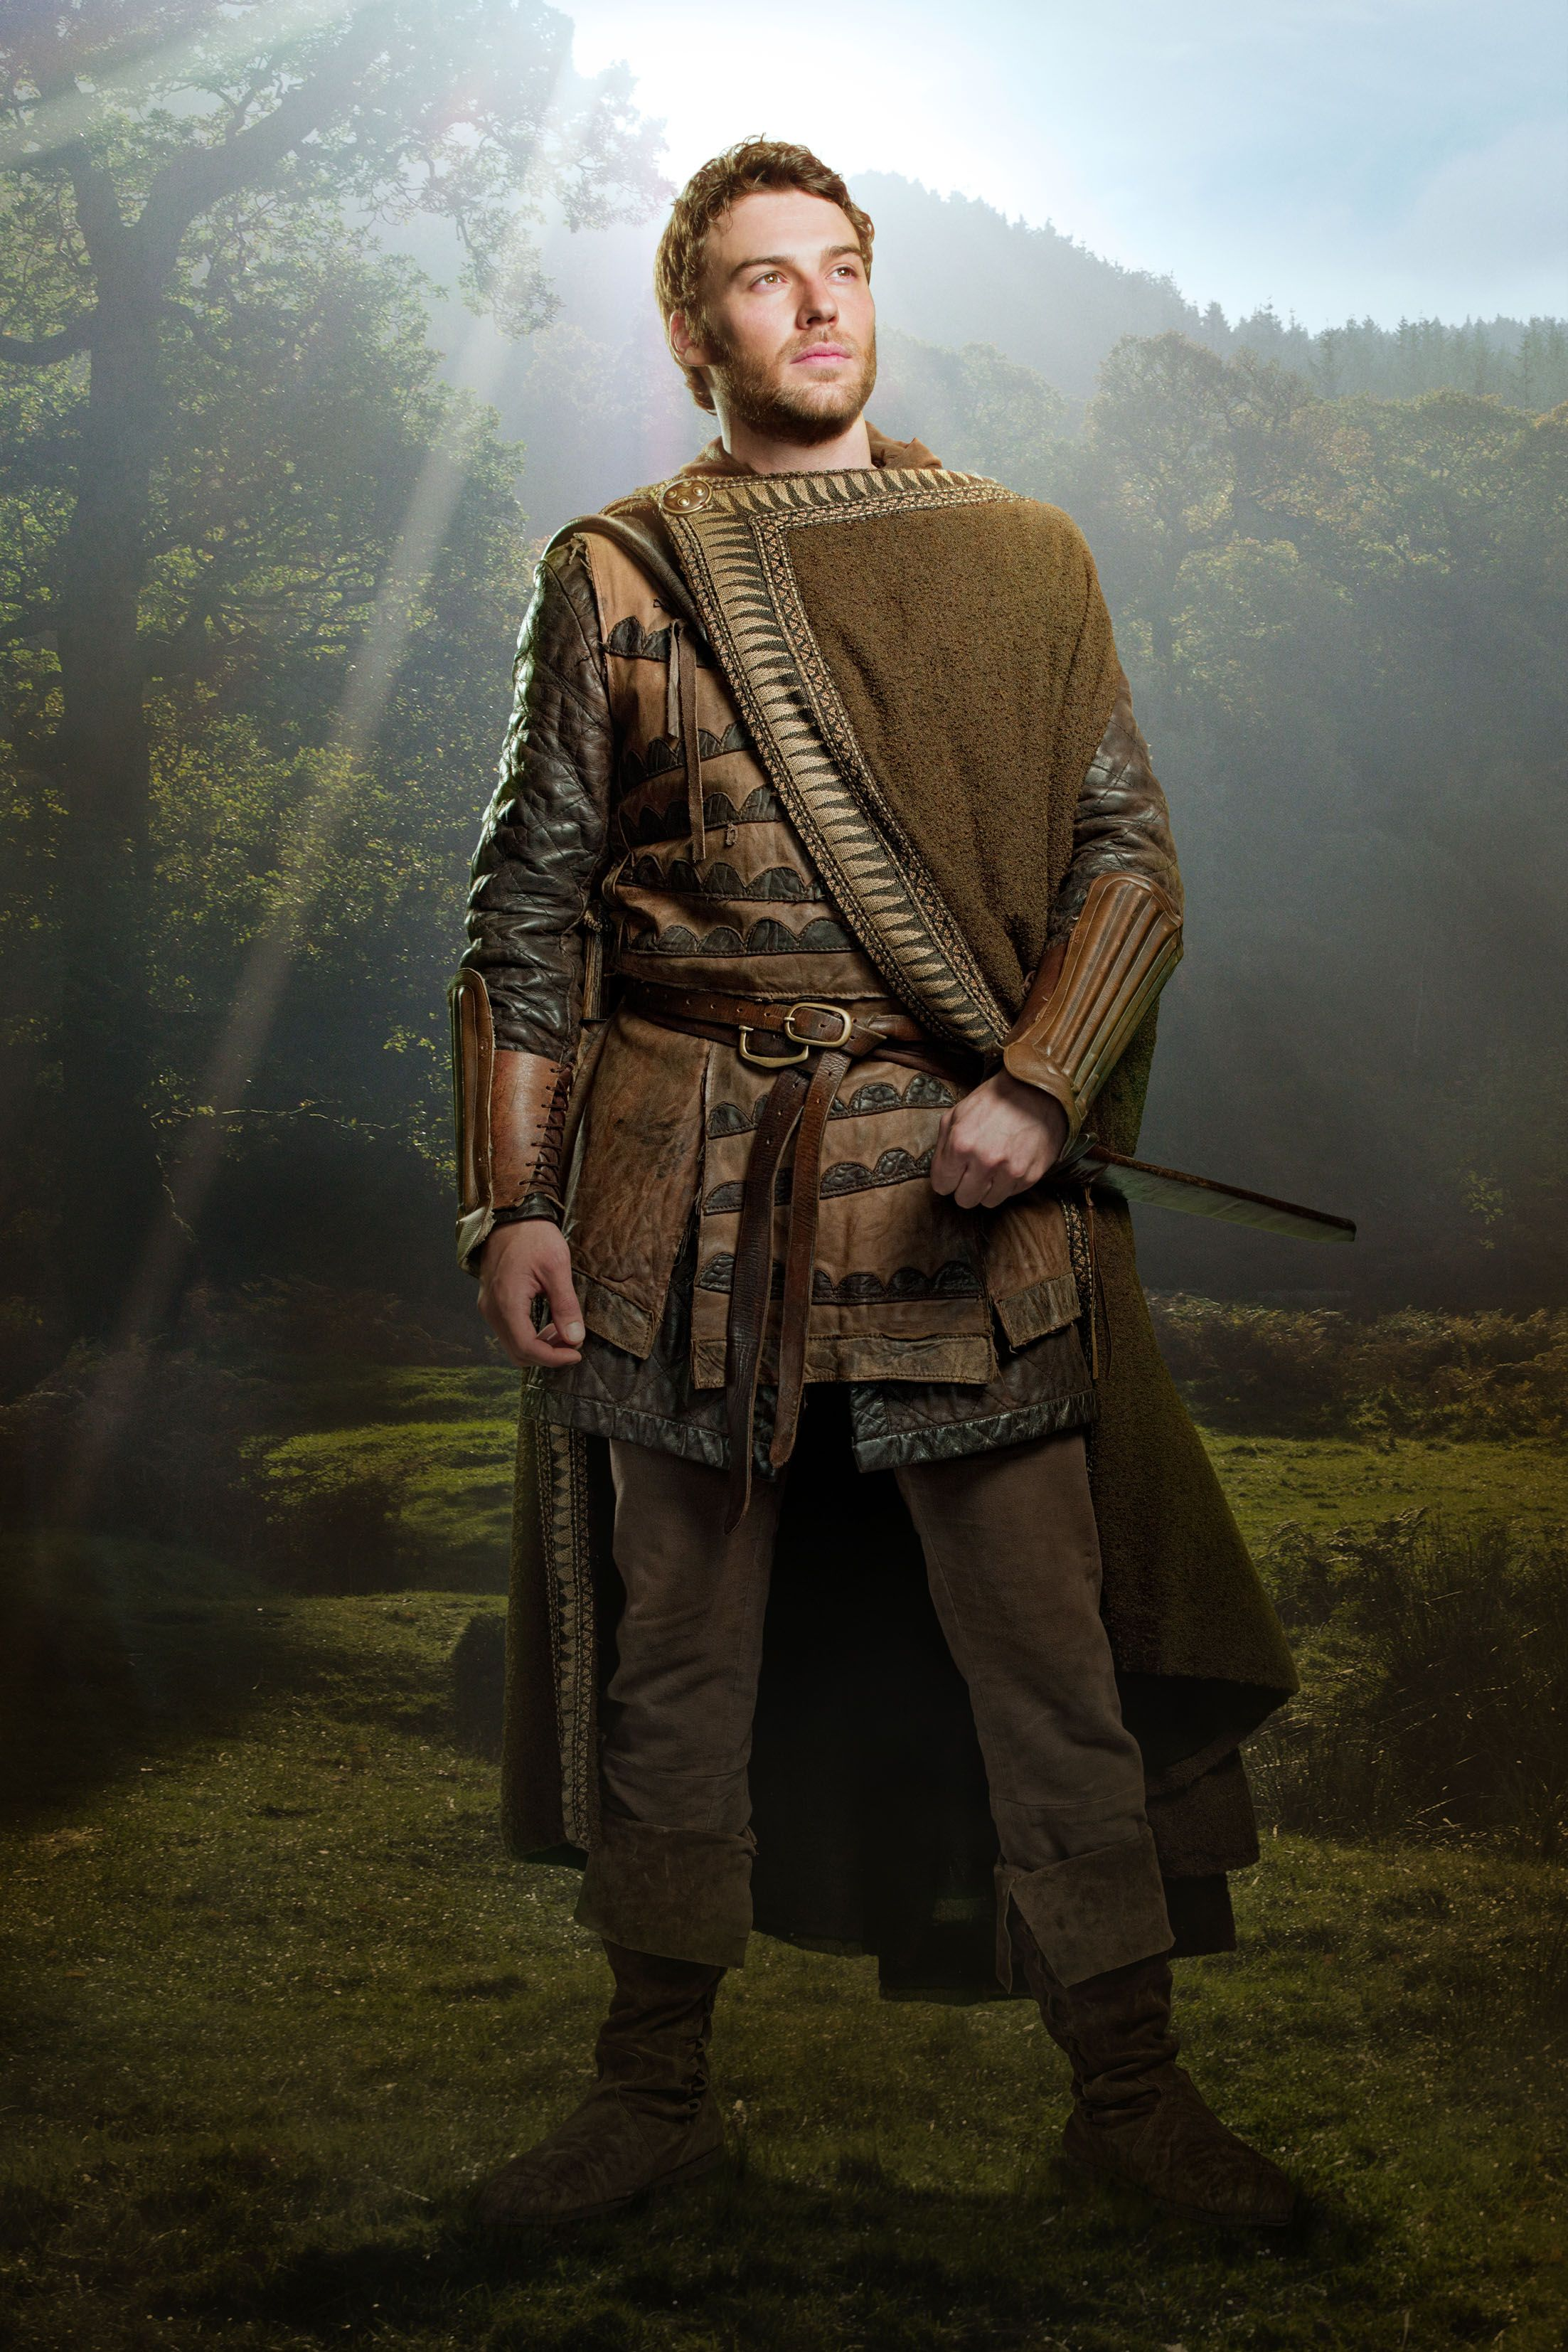 Camelot - Promo | Camelot | Peter mooney, Medieval fantasy ...